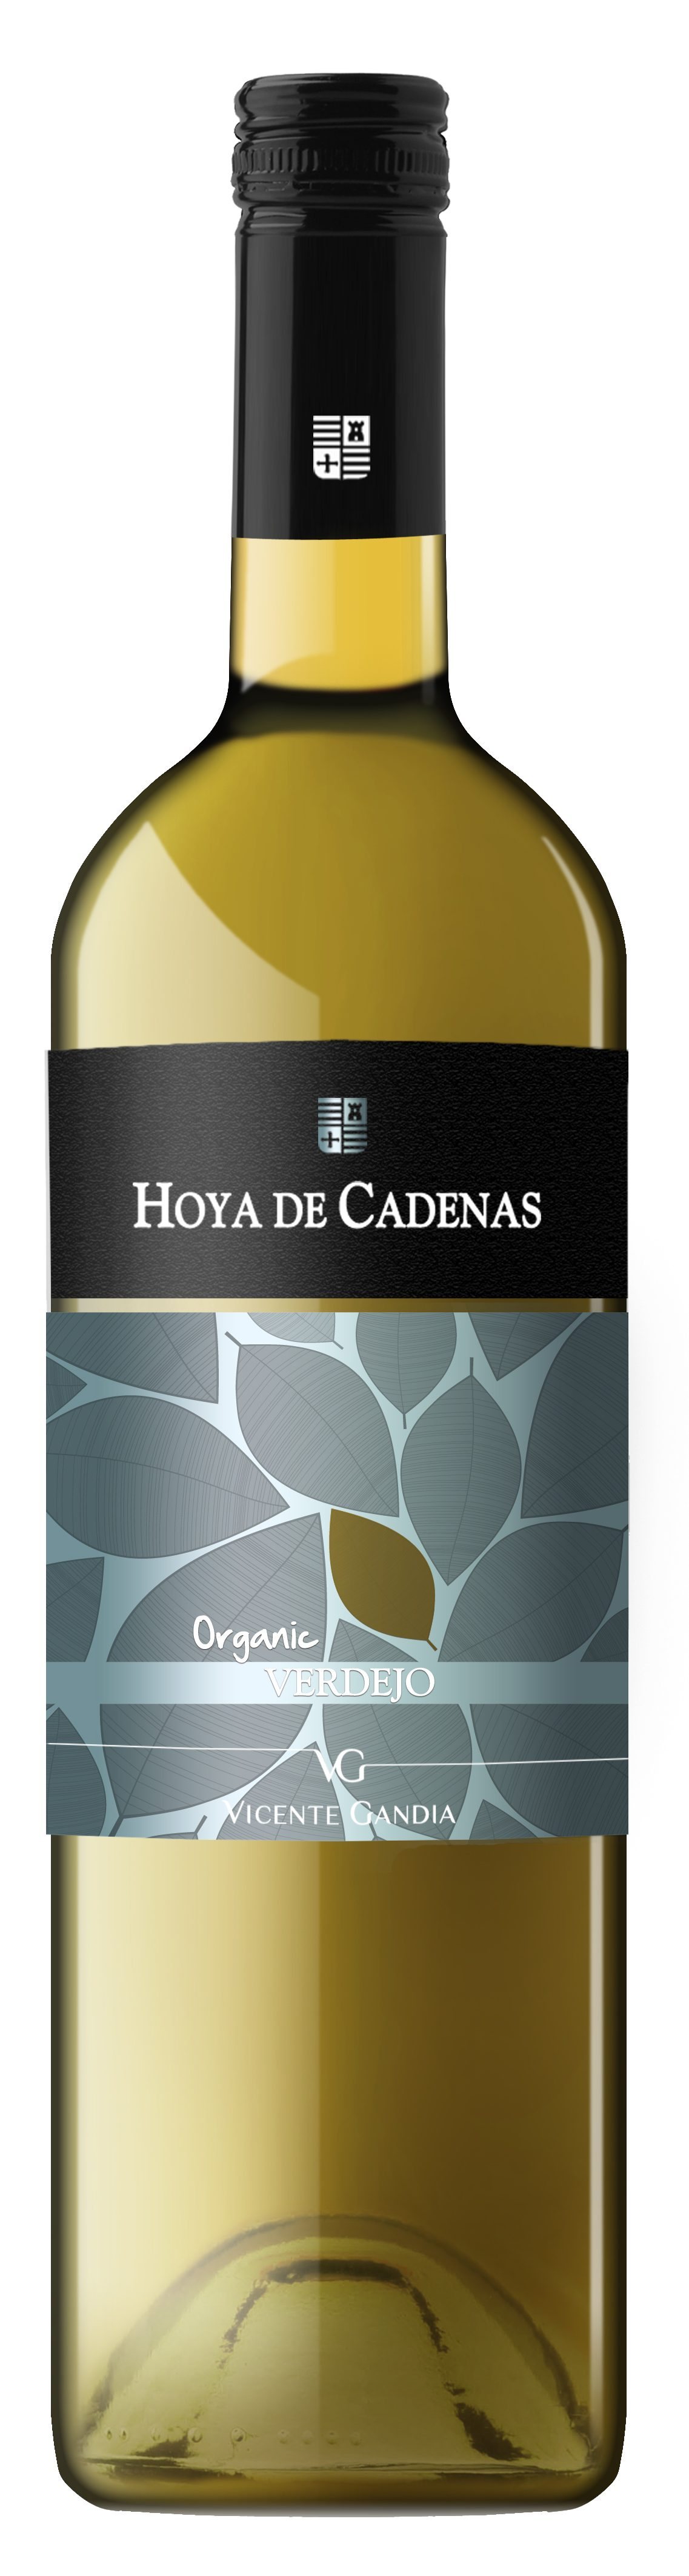 Vicente Gandia Hoya de Cadenas Organic Verdejo